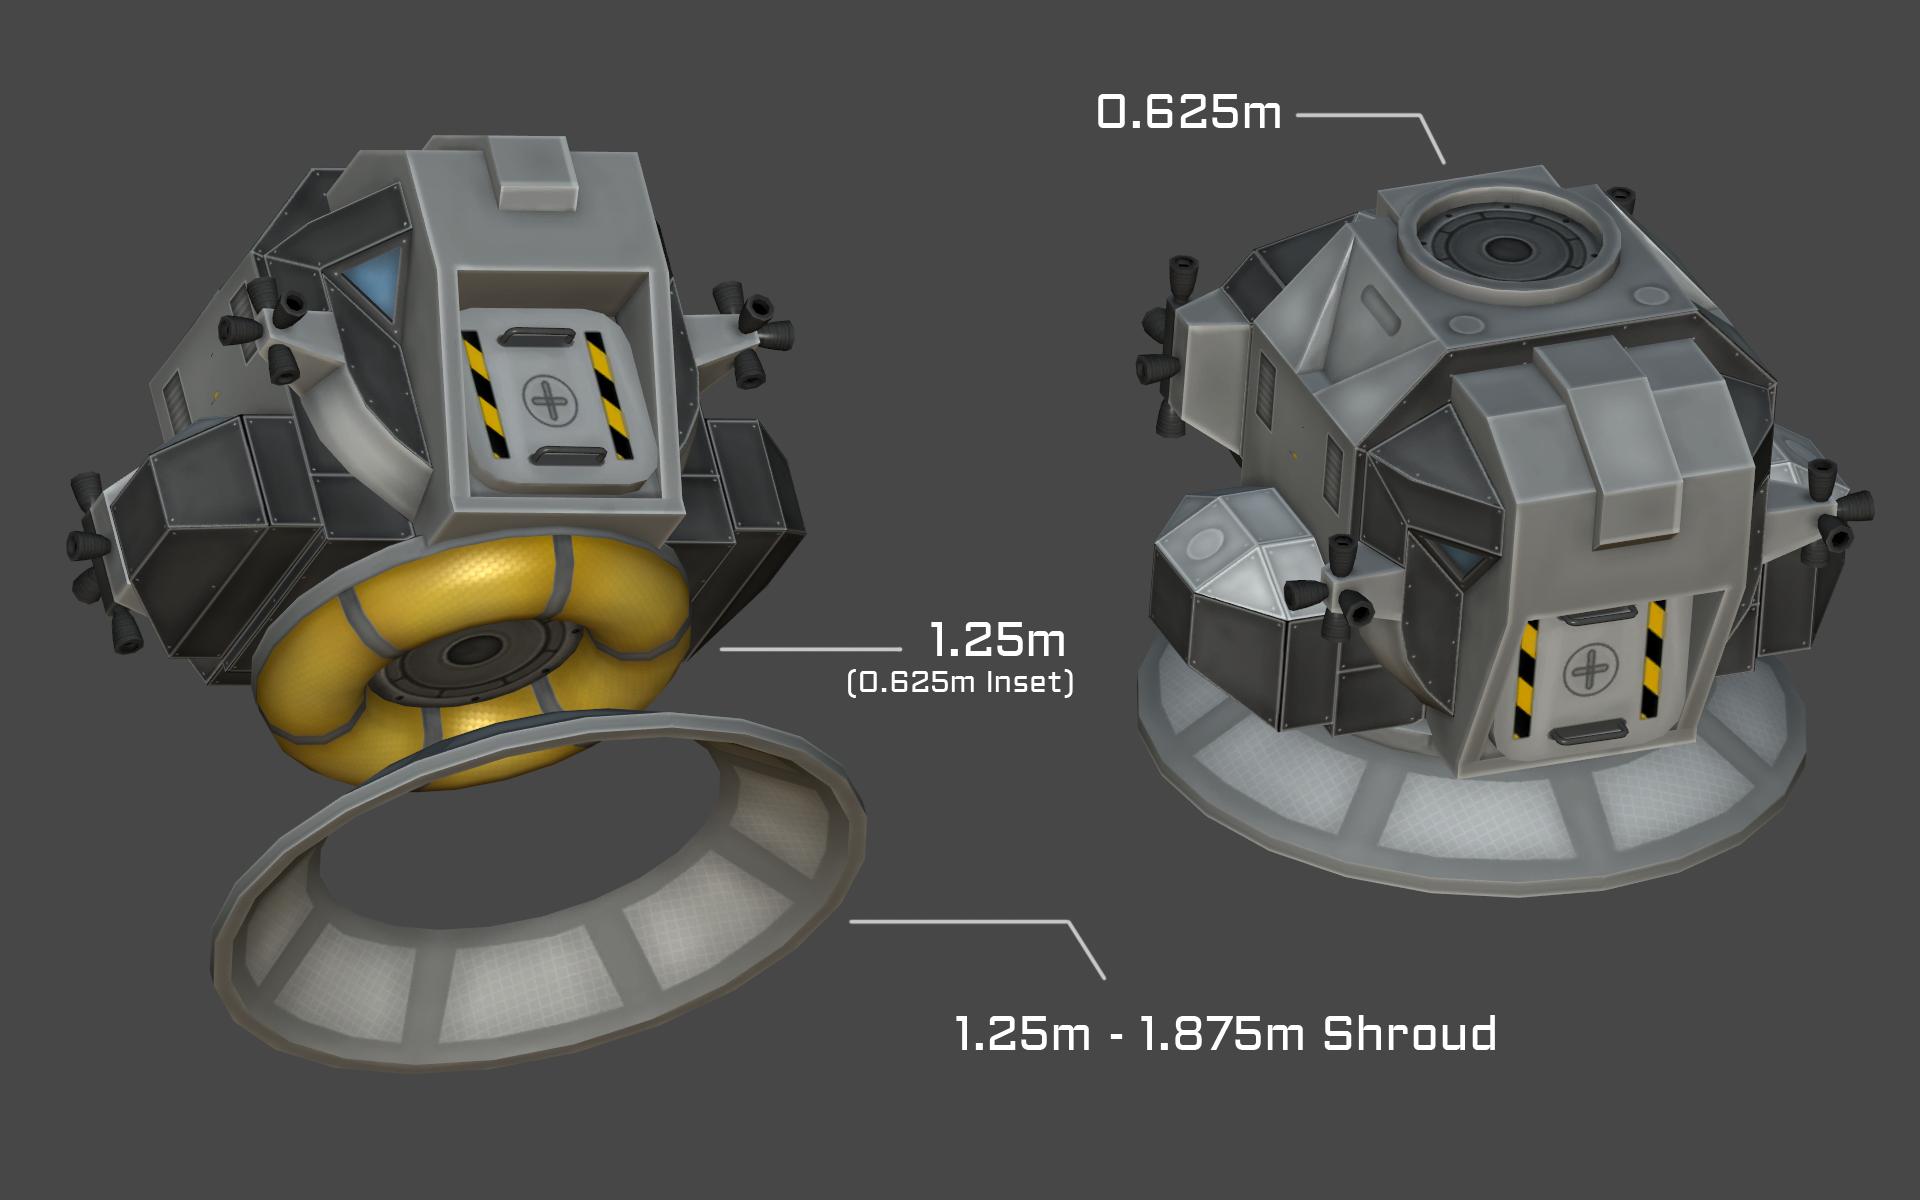 kerbal space program new parts - photo #27